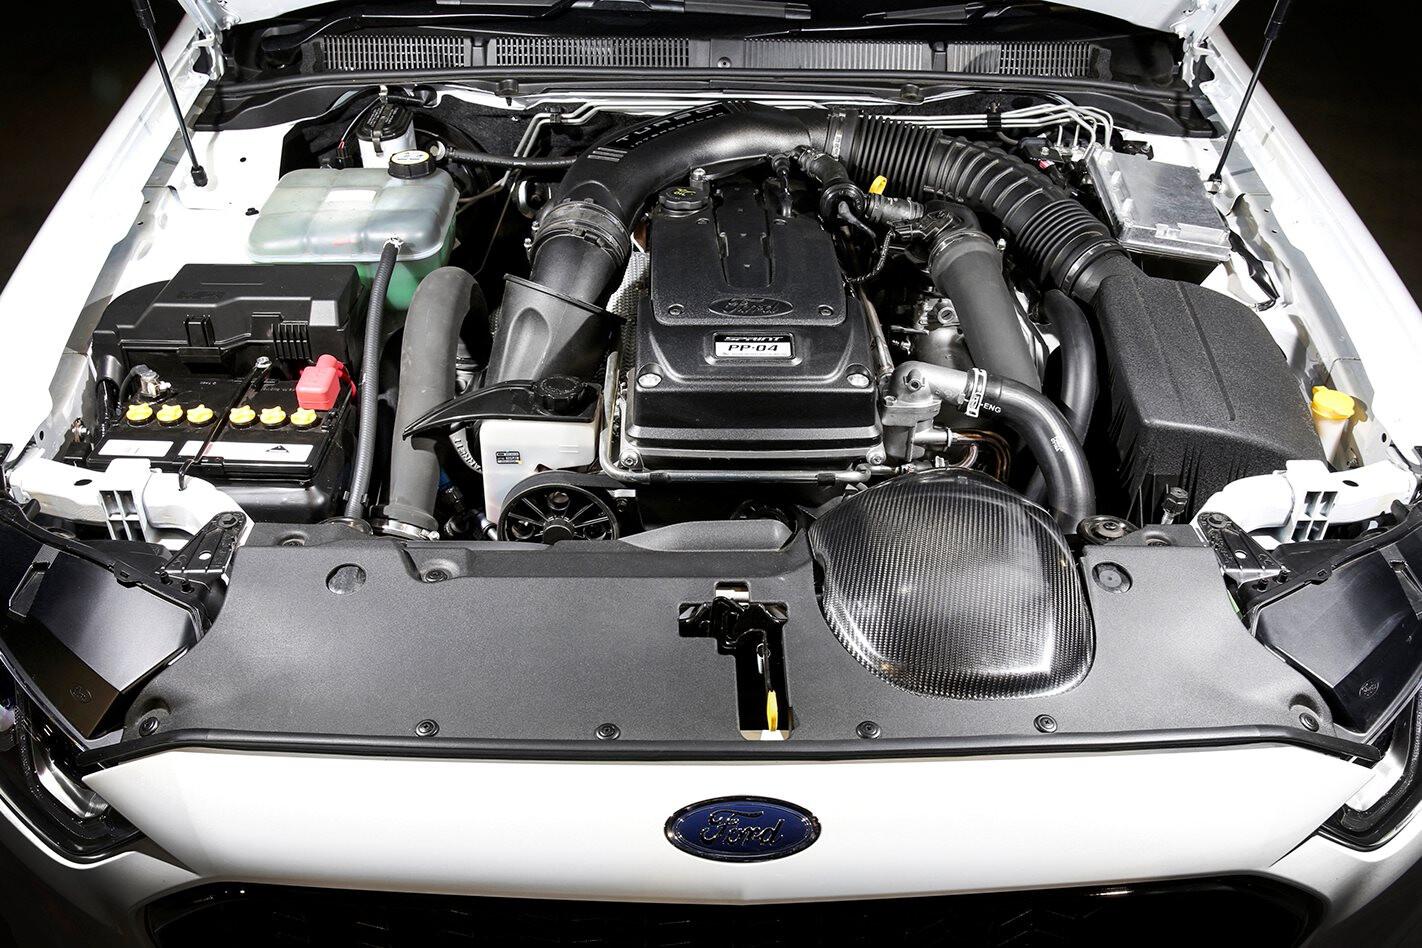 Ford Falcon Sprint 4 litre turbo engine